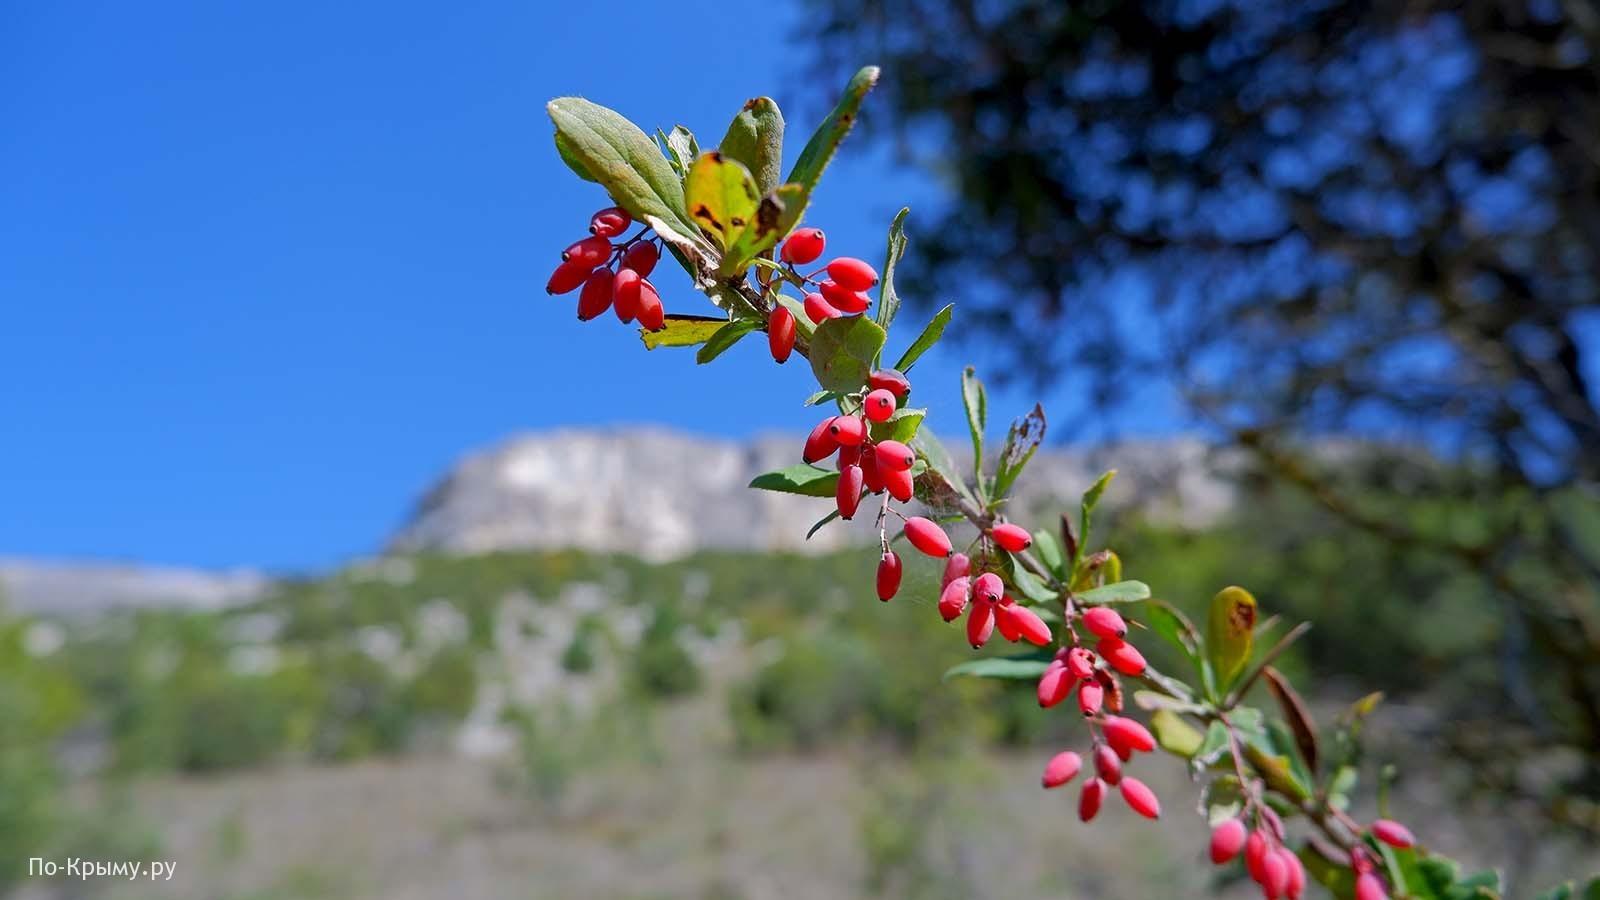 Долина Биюк Ашлама-Дере, спеет барбарис